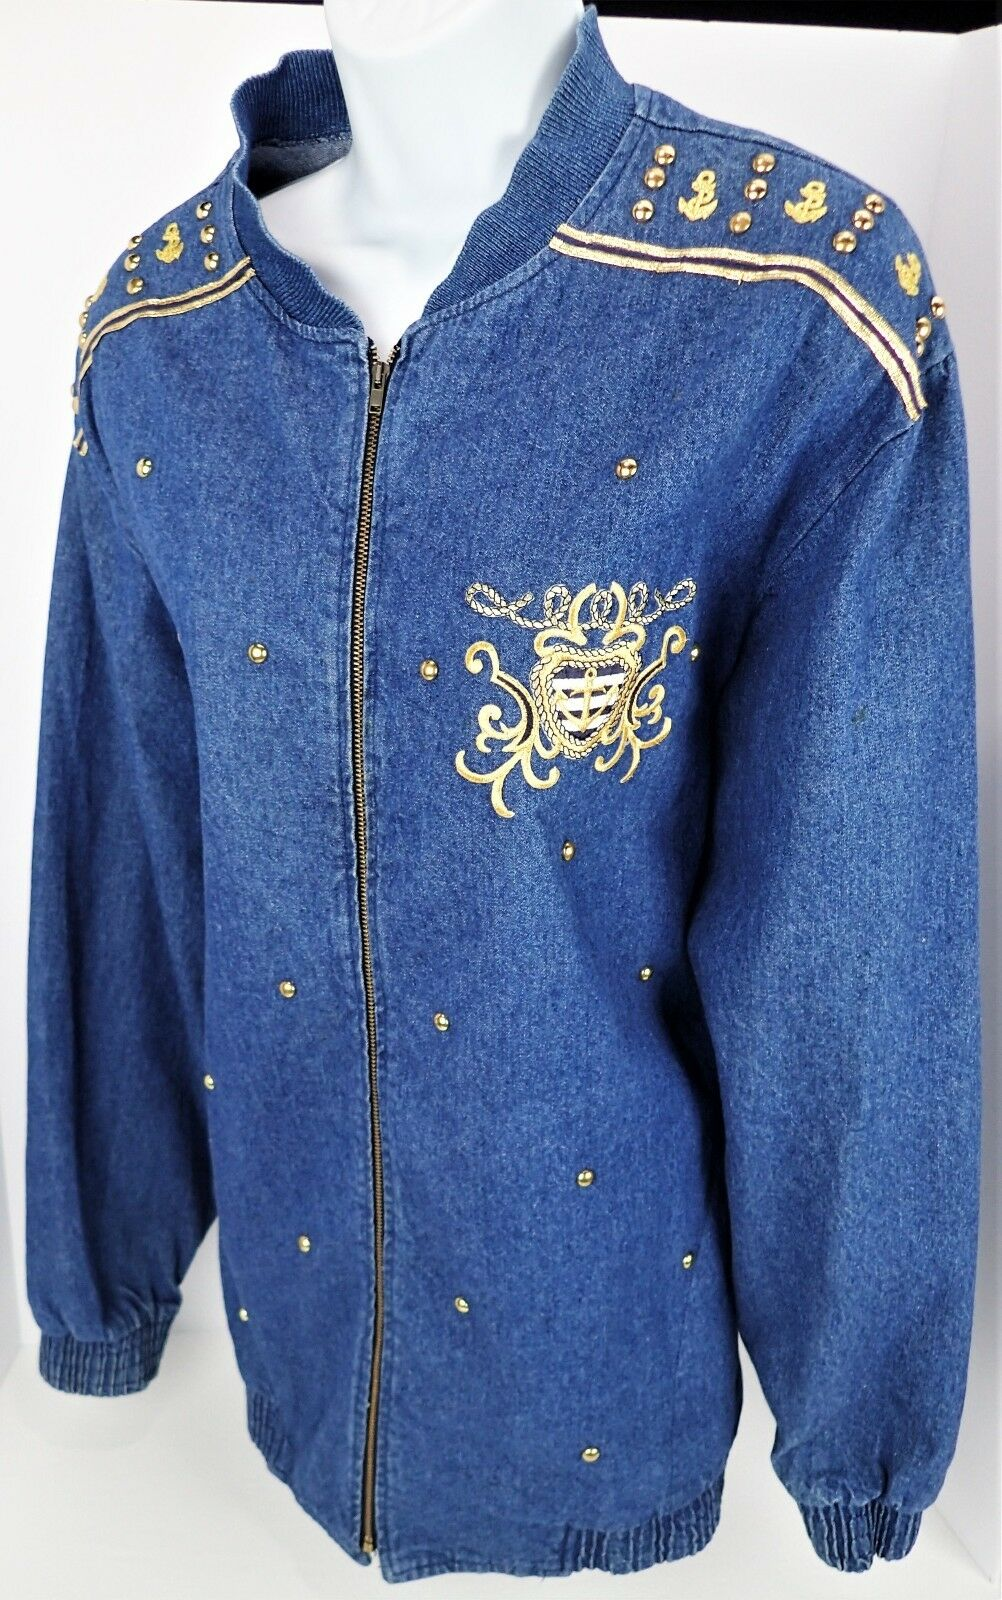 XL Gepetto Zip Front Denim Jacket Retro Vtg 80s Nautical Embellished Gold Studs